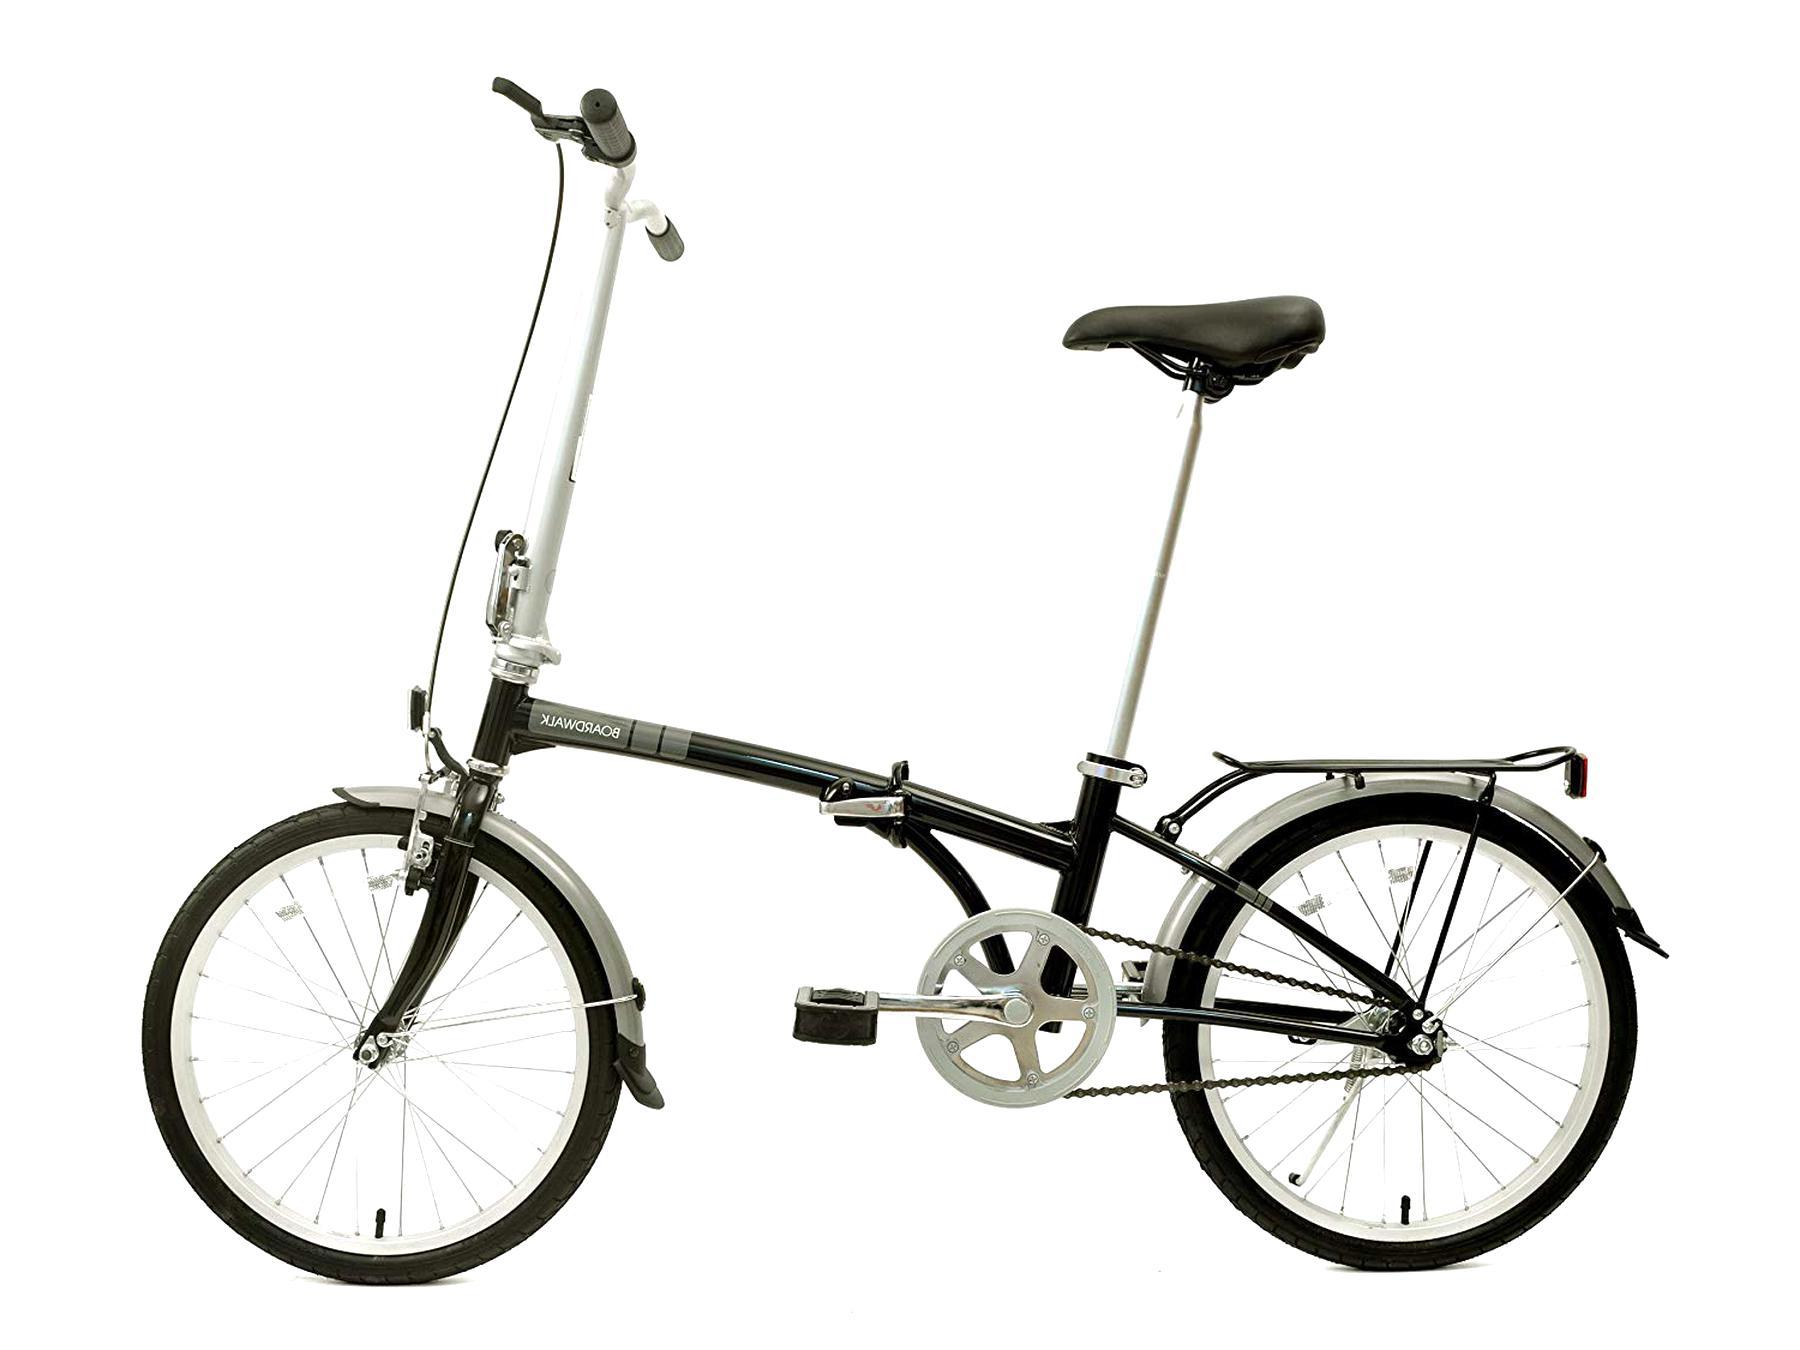 dahon bike for sale